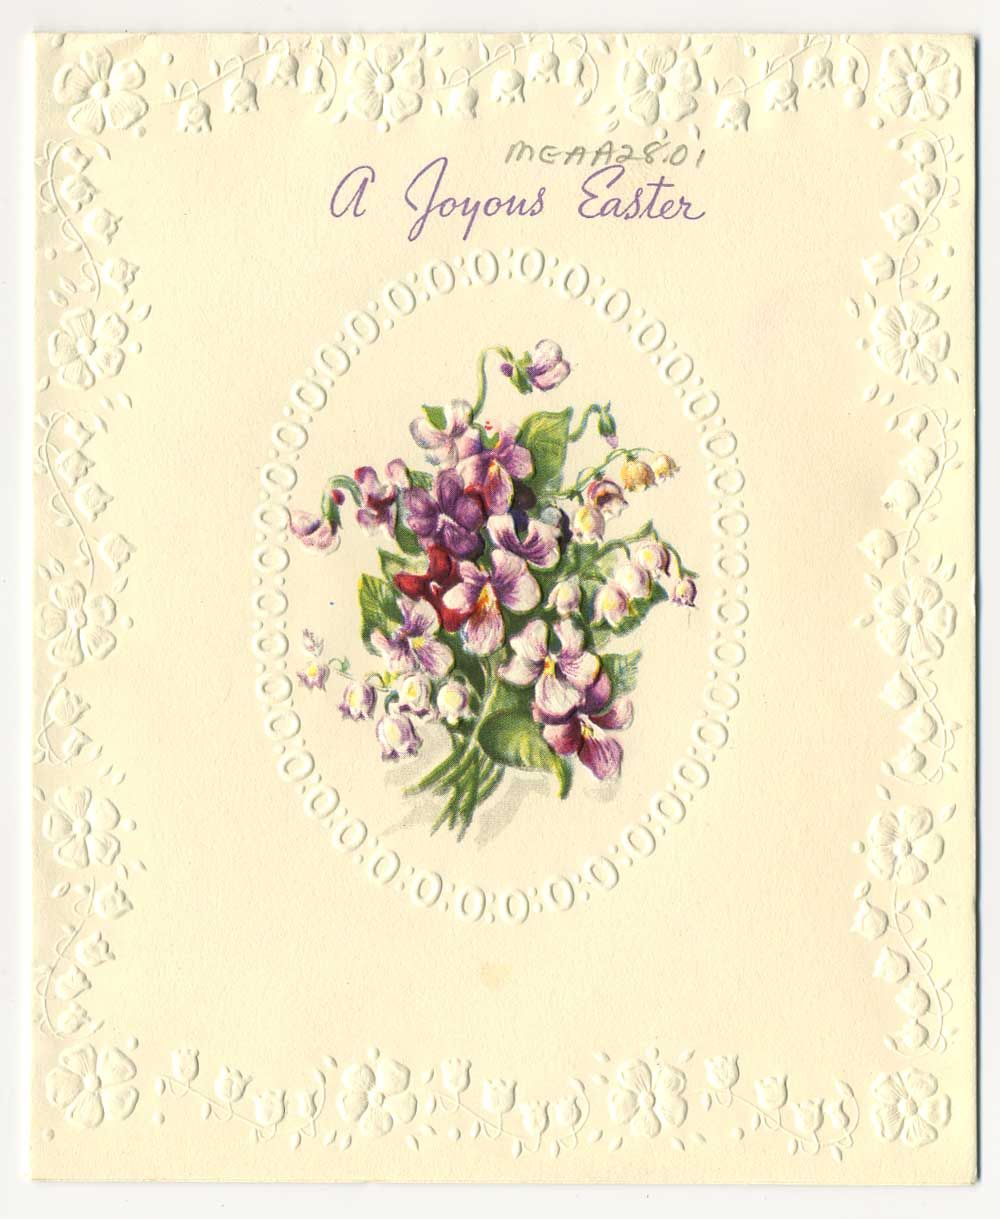 Vintage Easter Cards Cardinal Mcguigan Fonds The Archivists